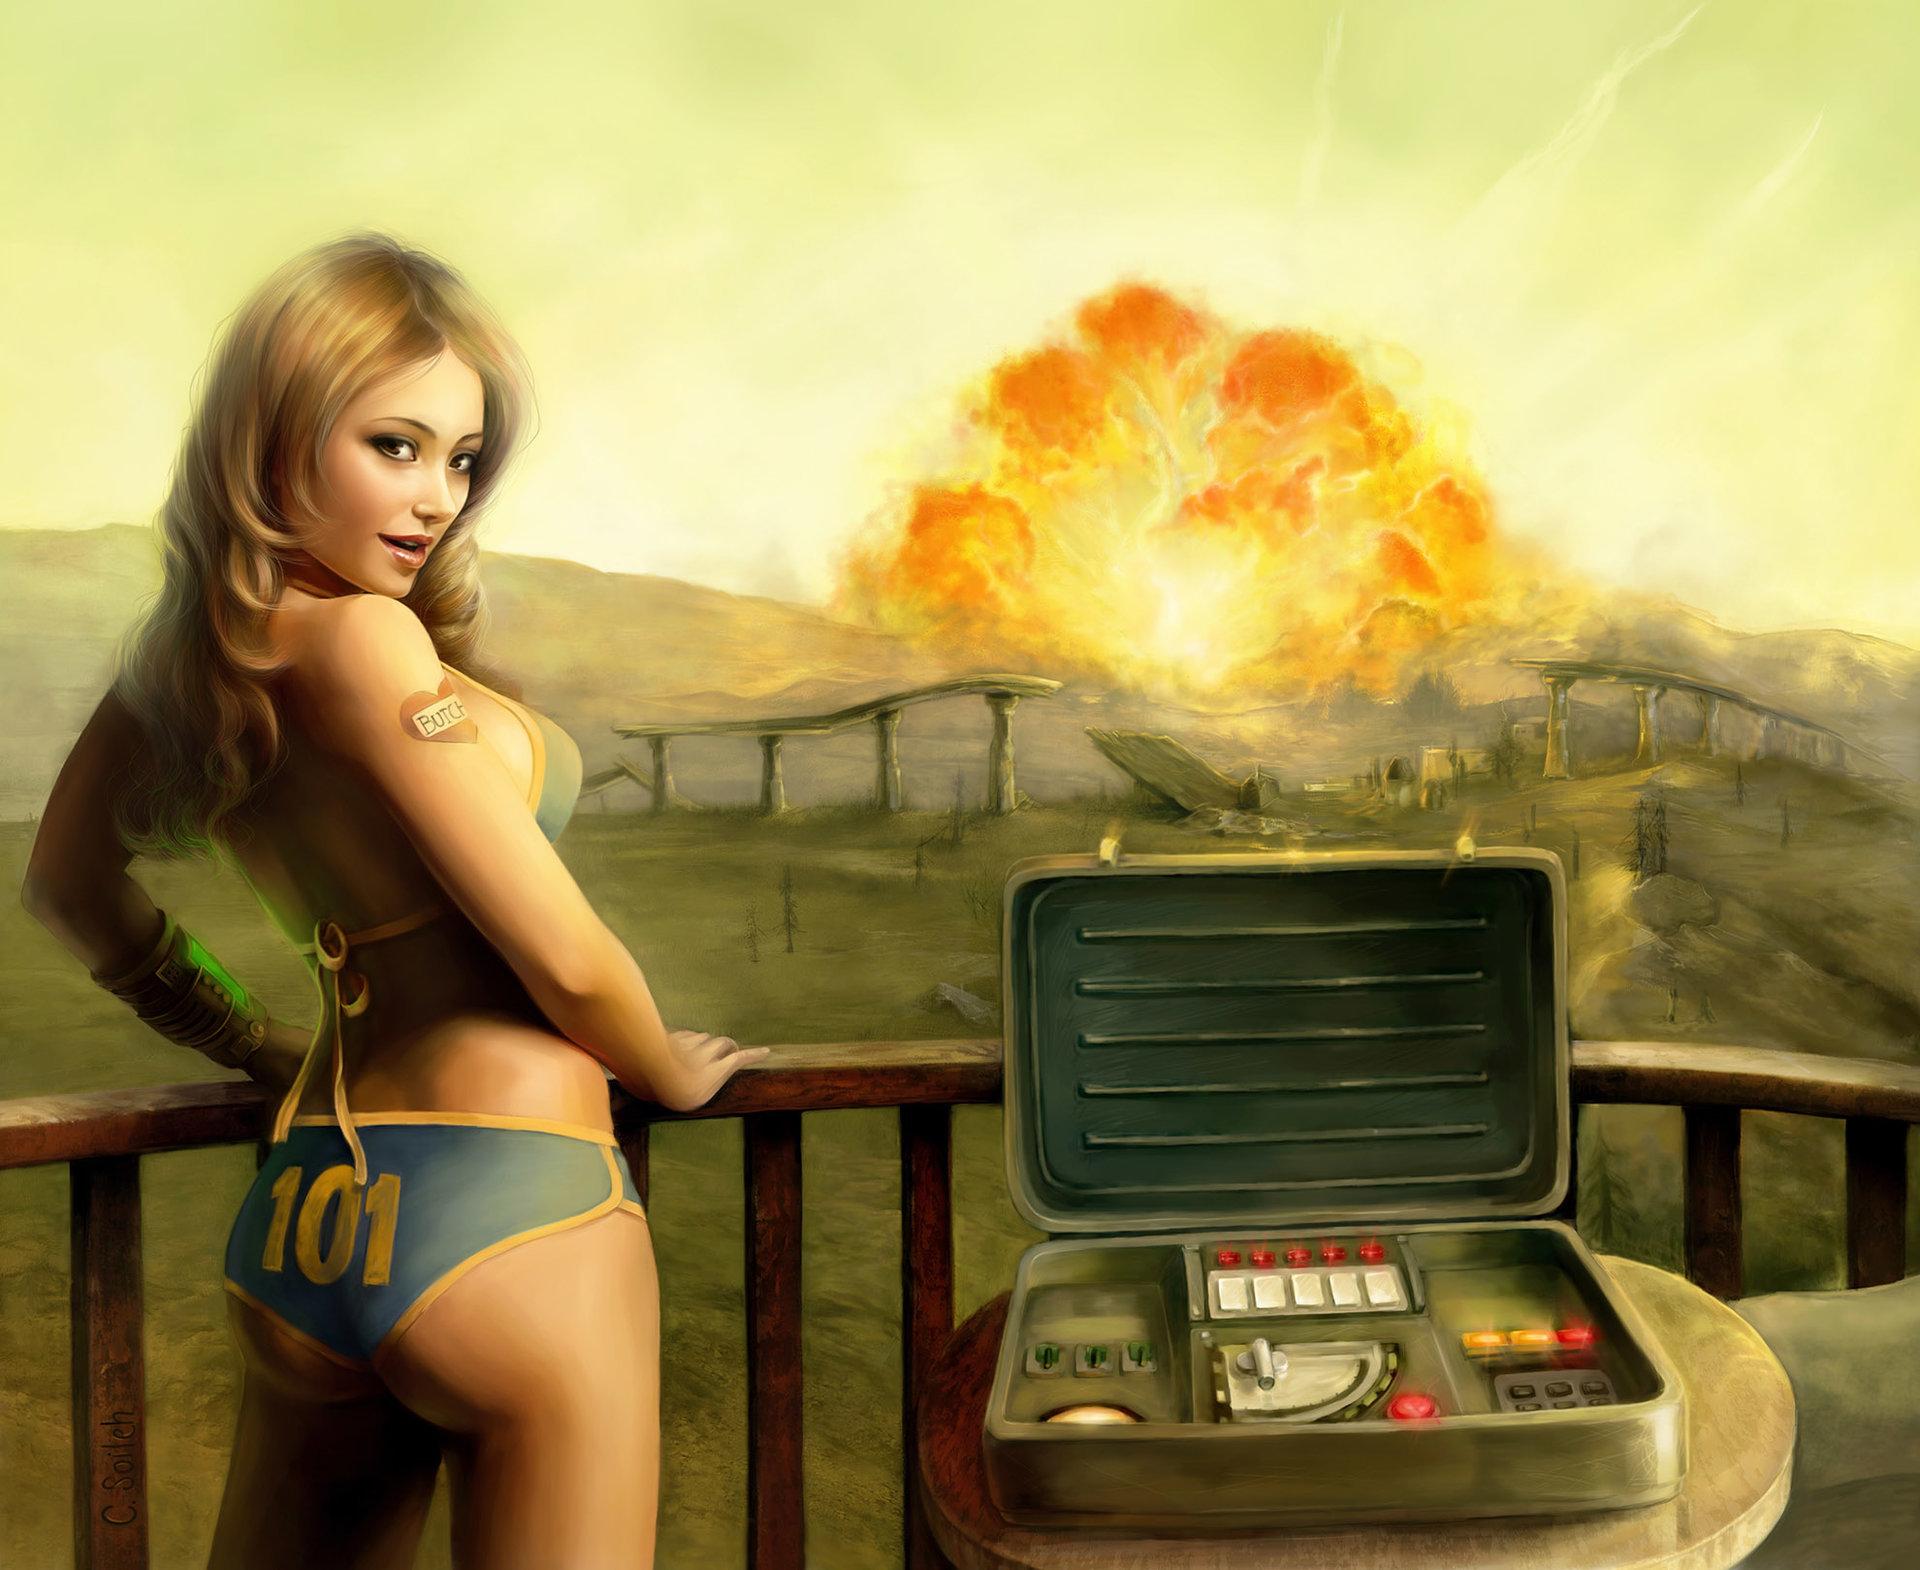 charlotte-soileh-fallout-3-csoileh-tenpenny-babe-2011-s.jpg